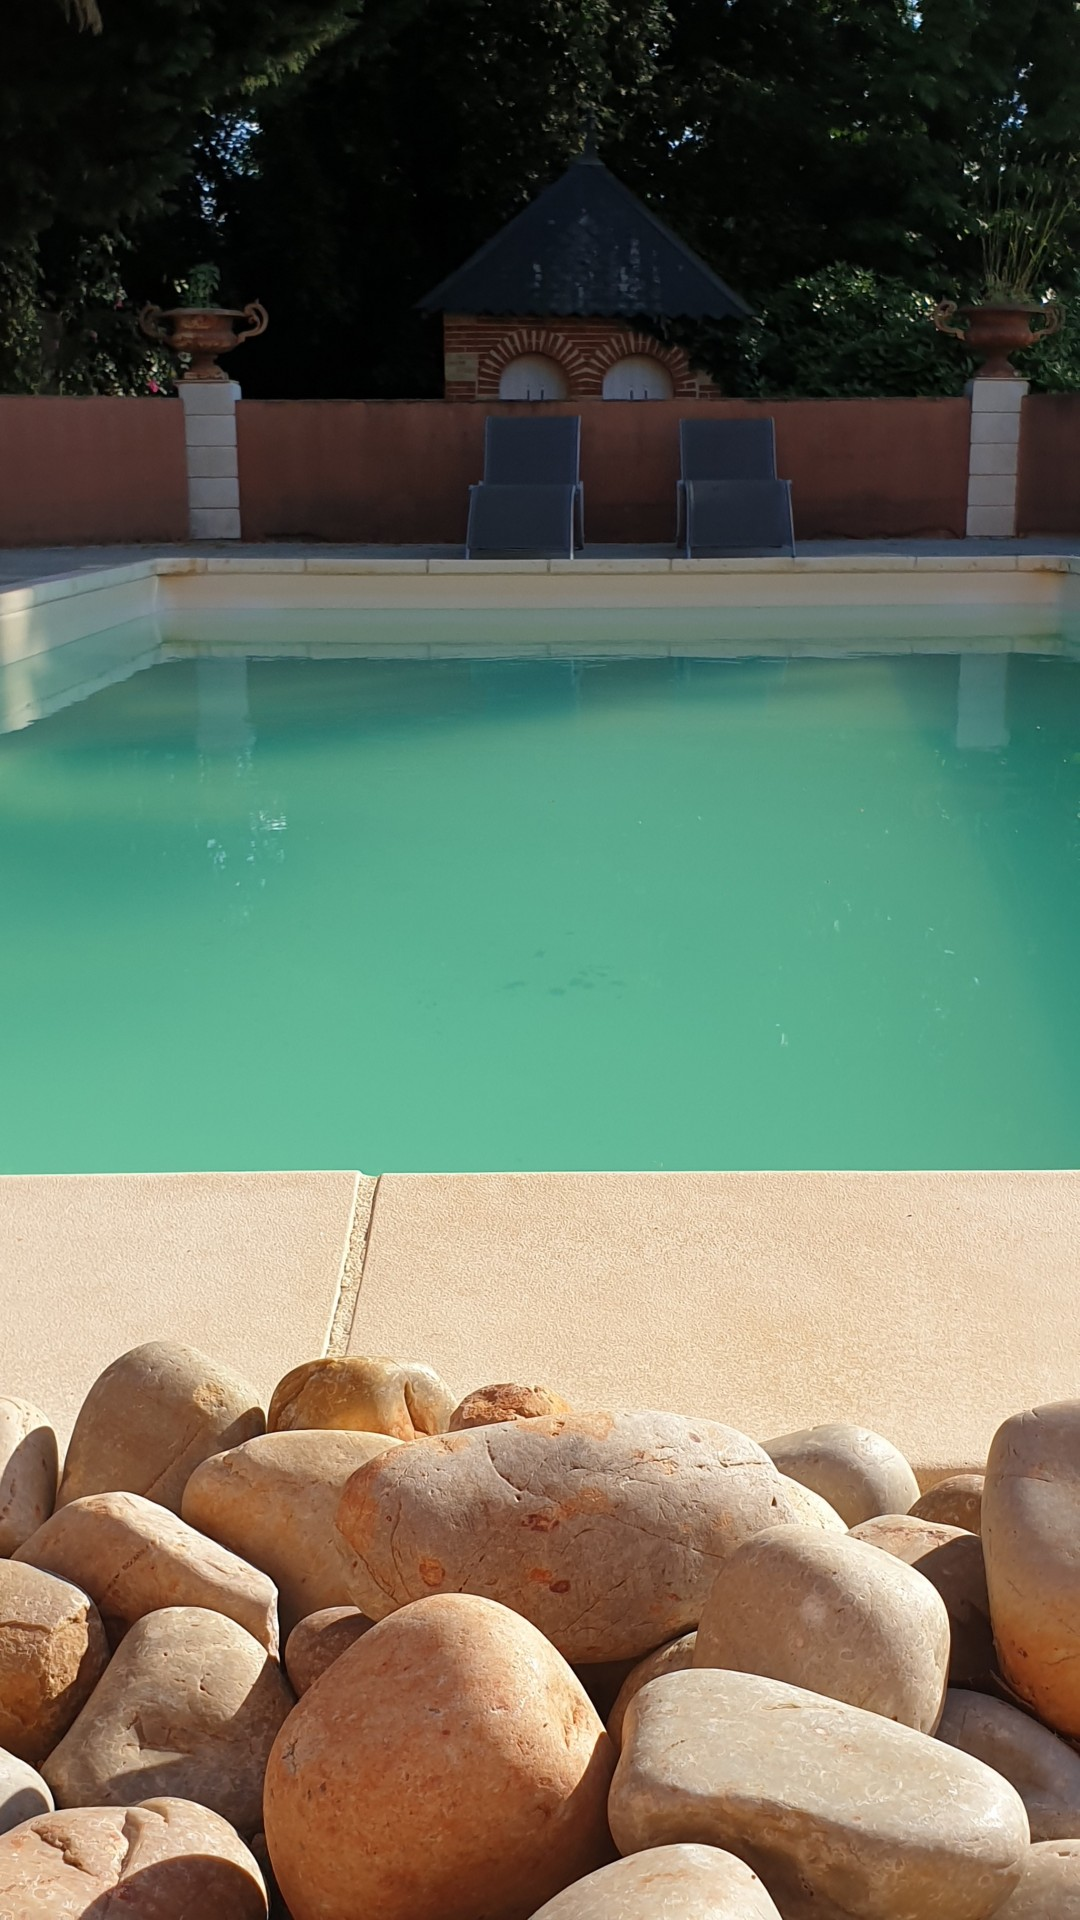 ch-908-e-pool1-3931